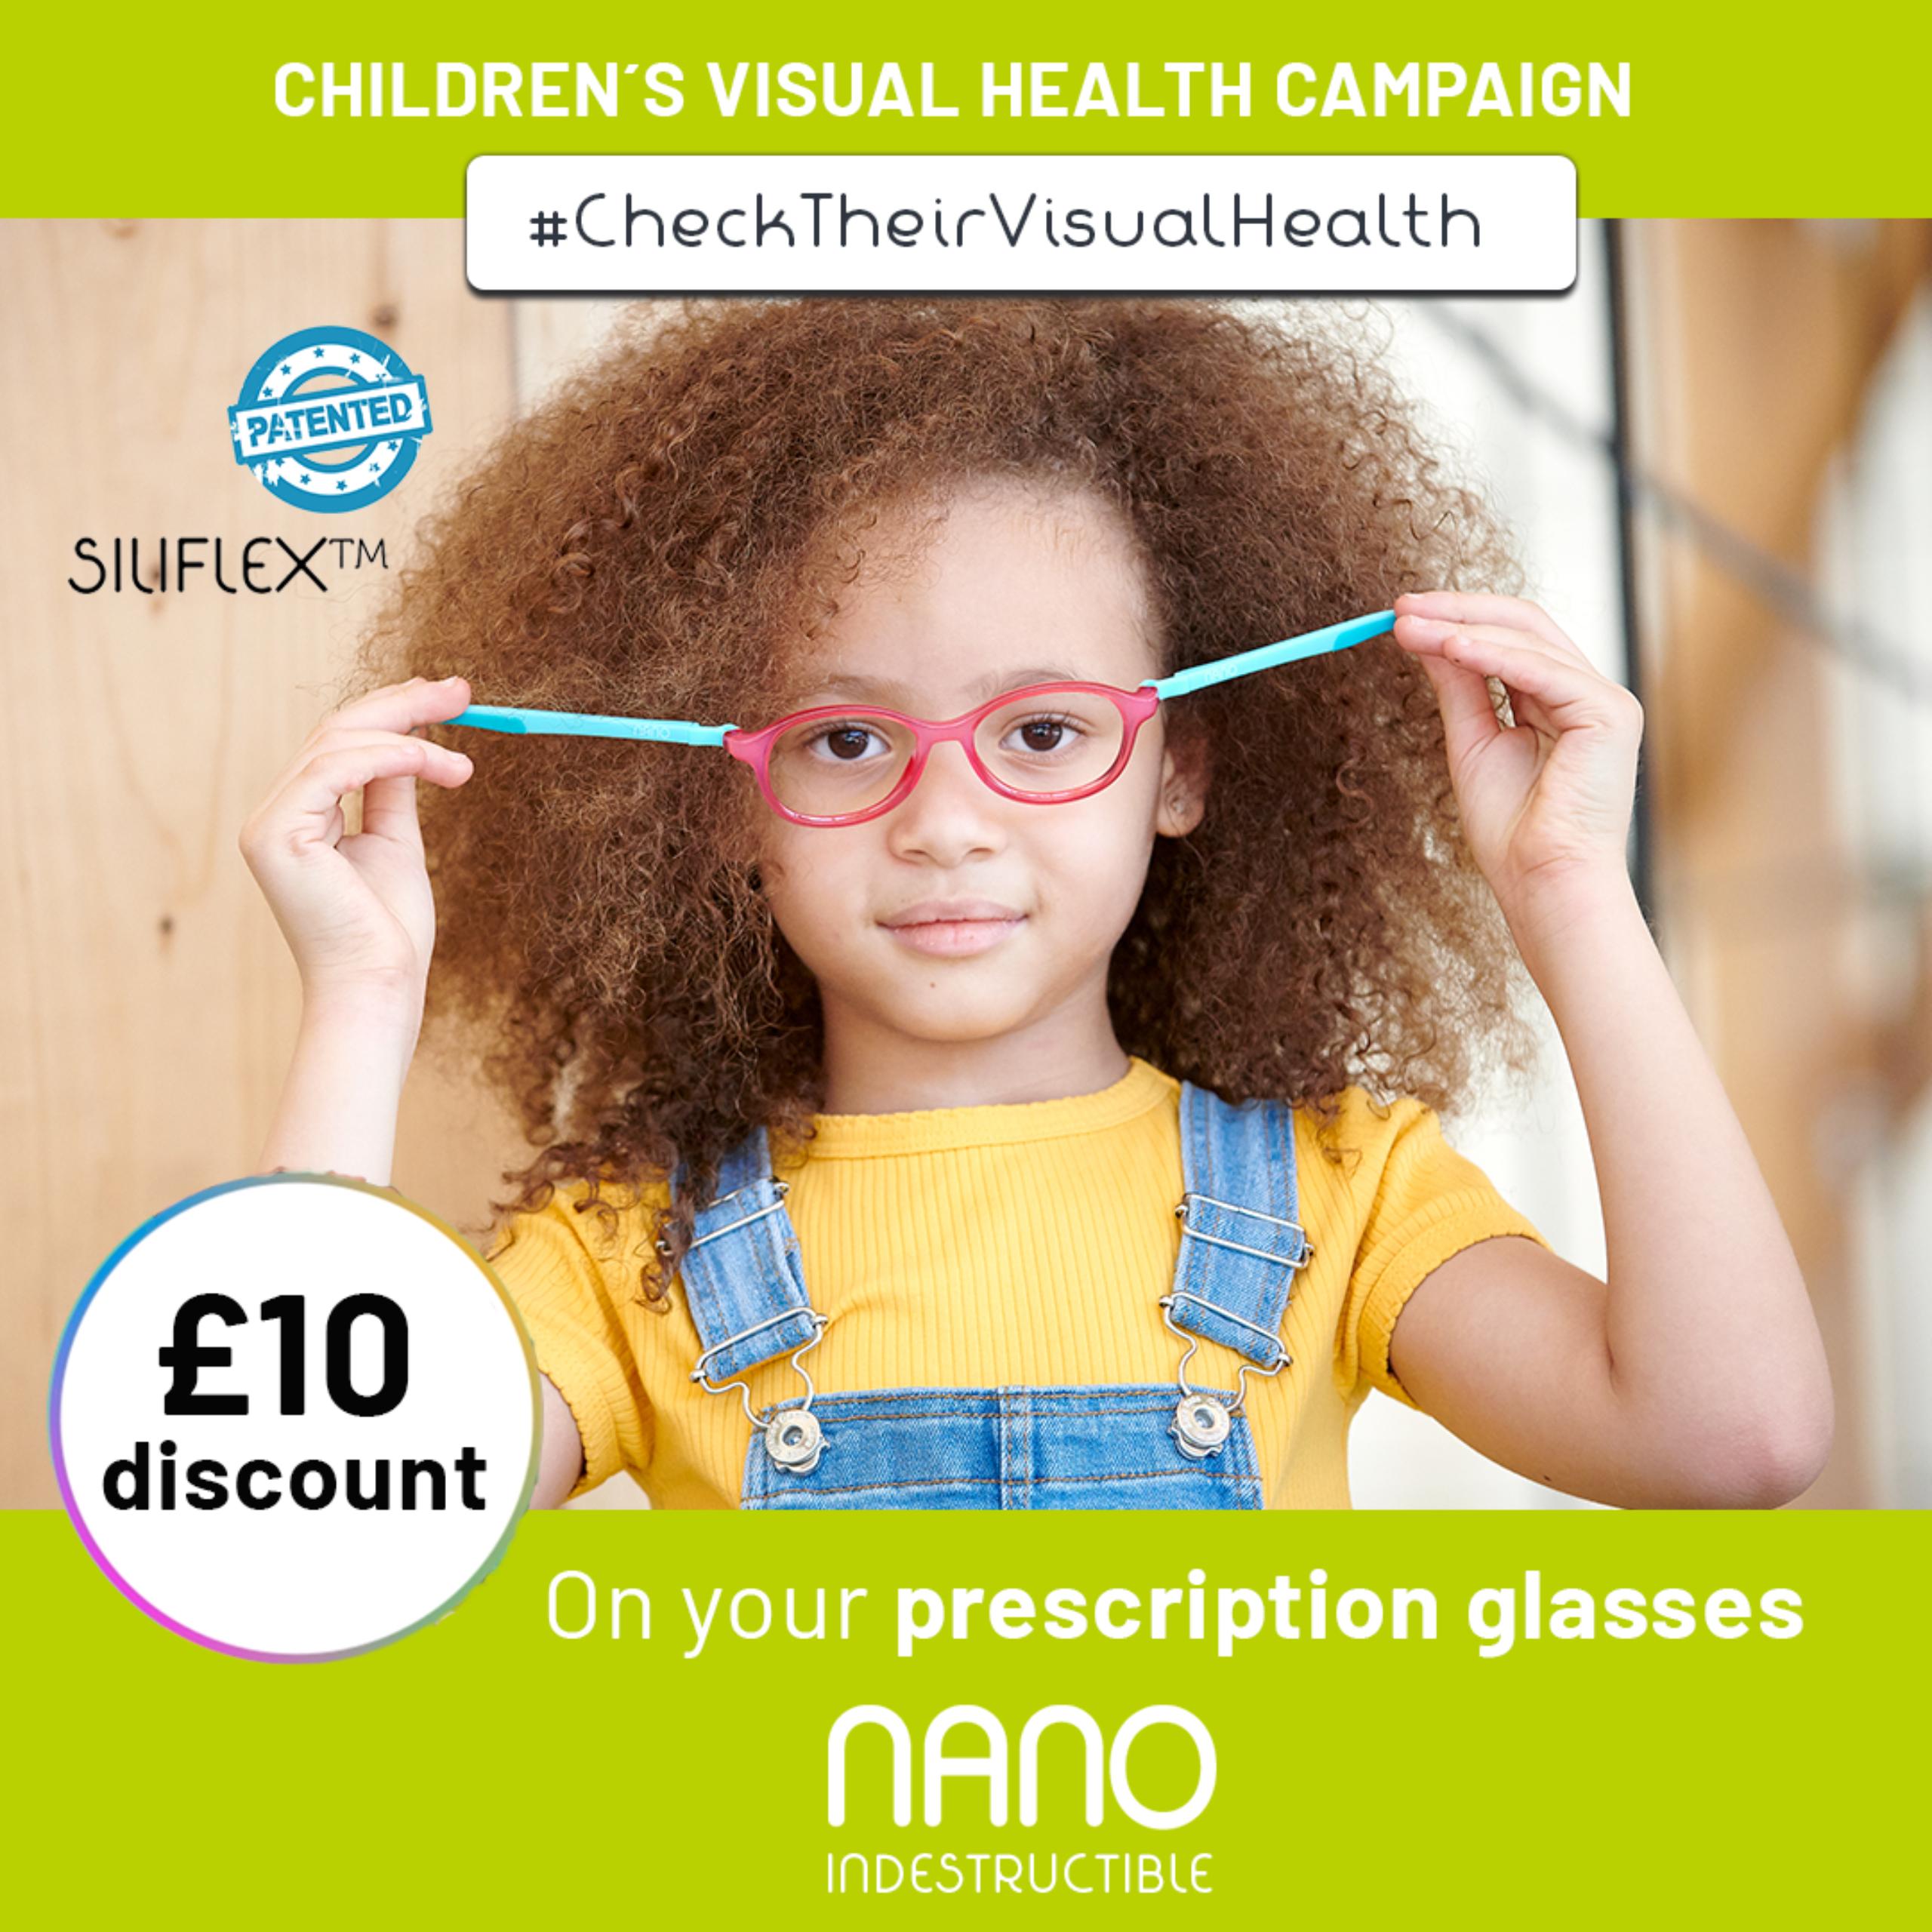 Download your £10 Nanovista Discount voucher